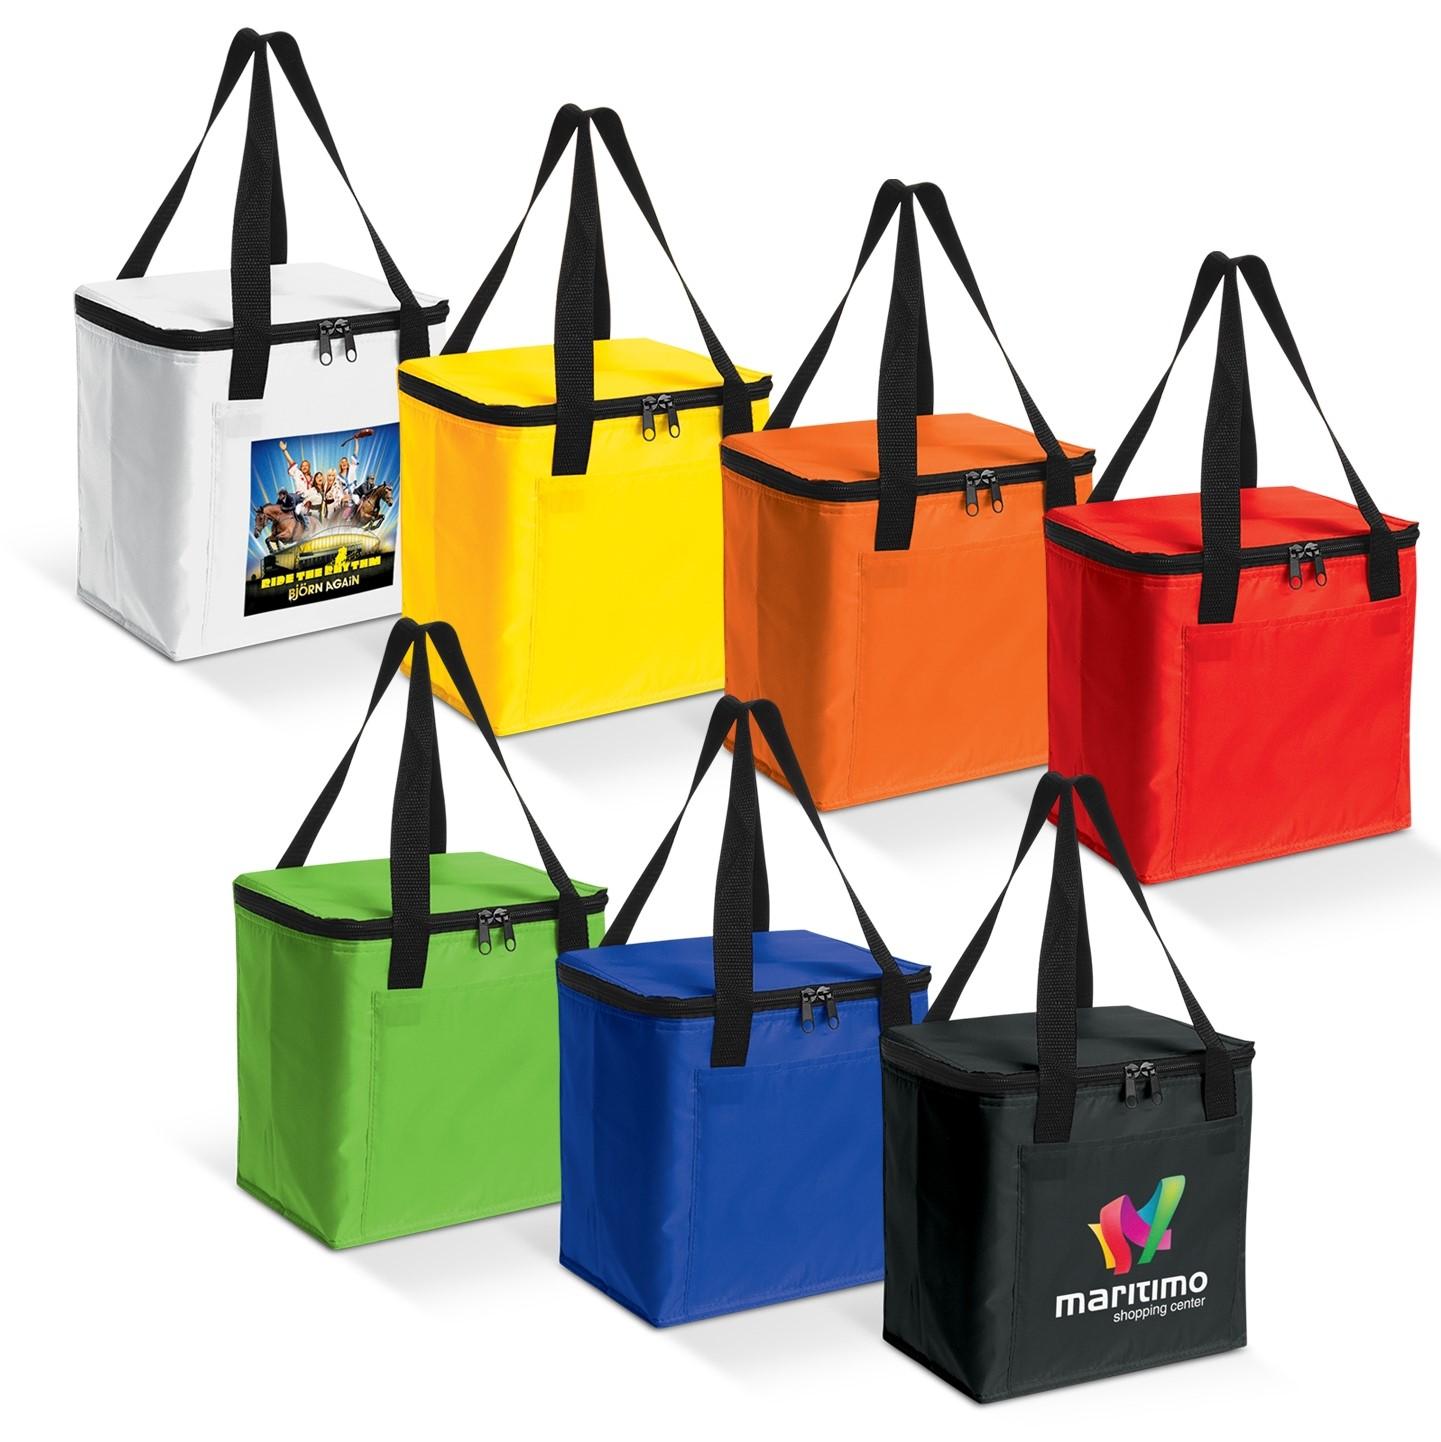 Eski & Cooler Bags